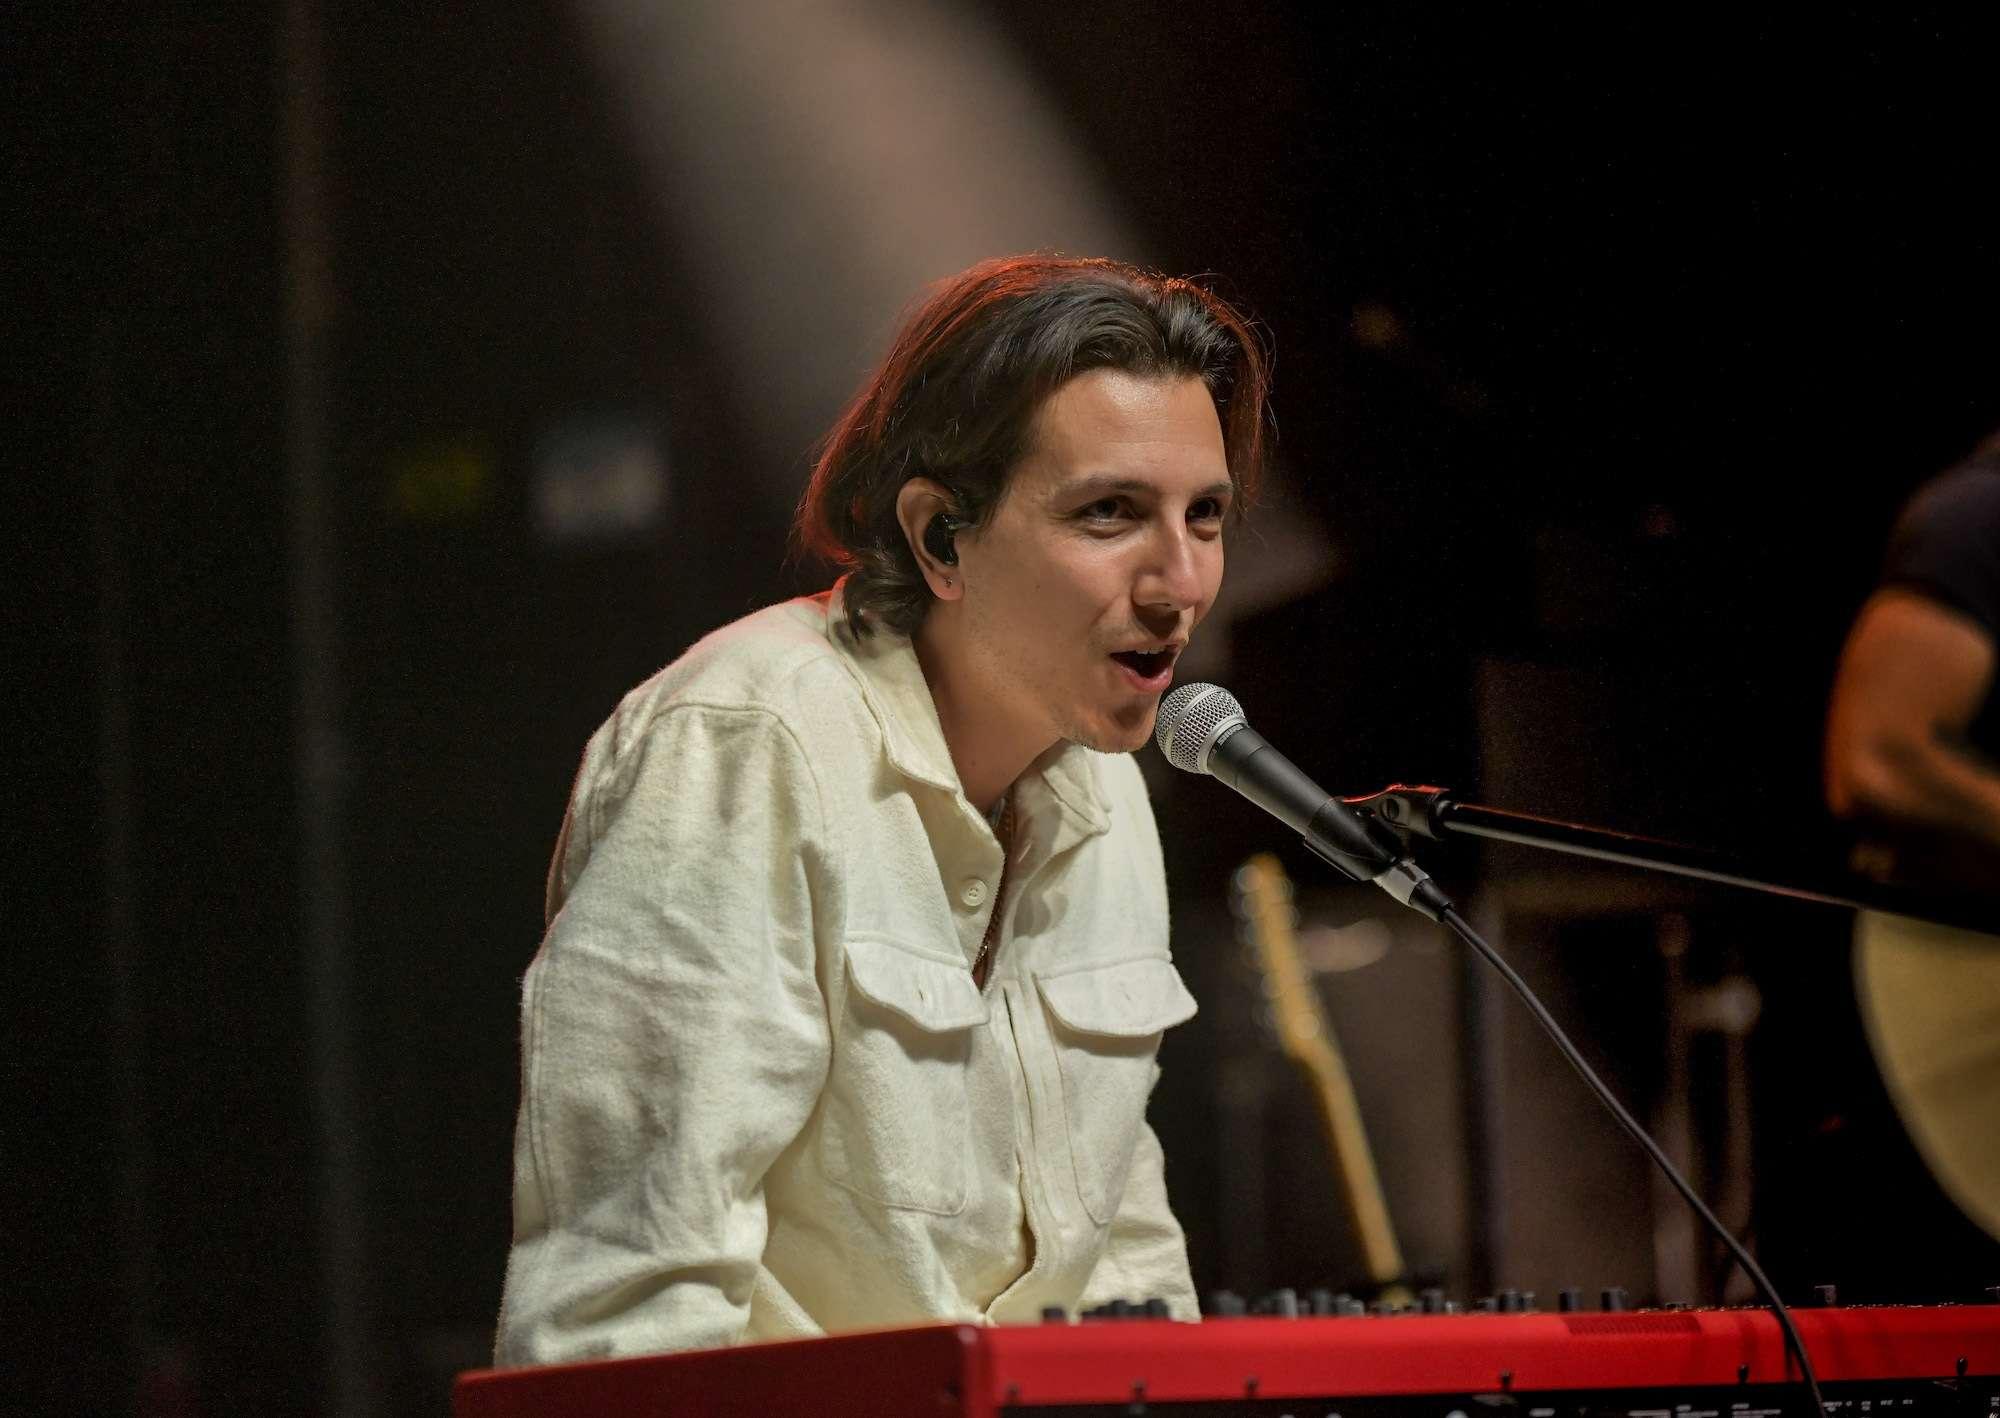 Anson Seabra Live at Riviera [GALLERY] 16